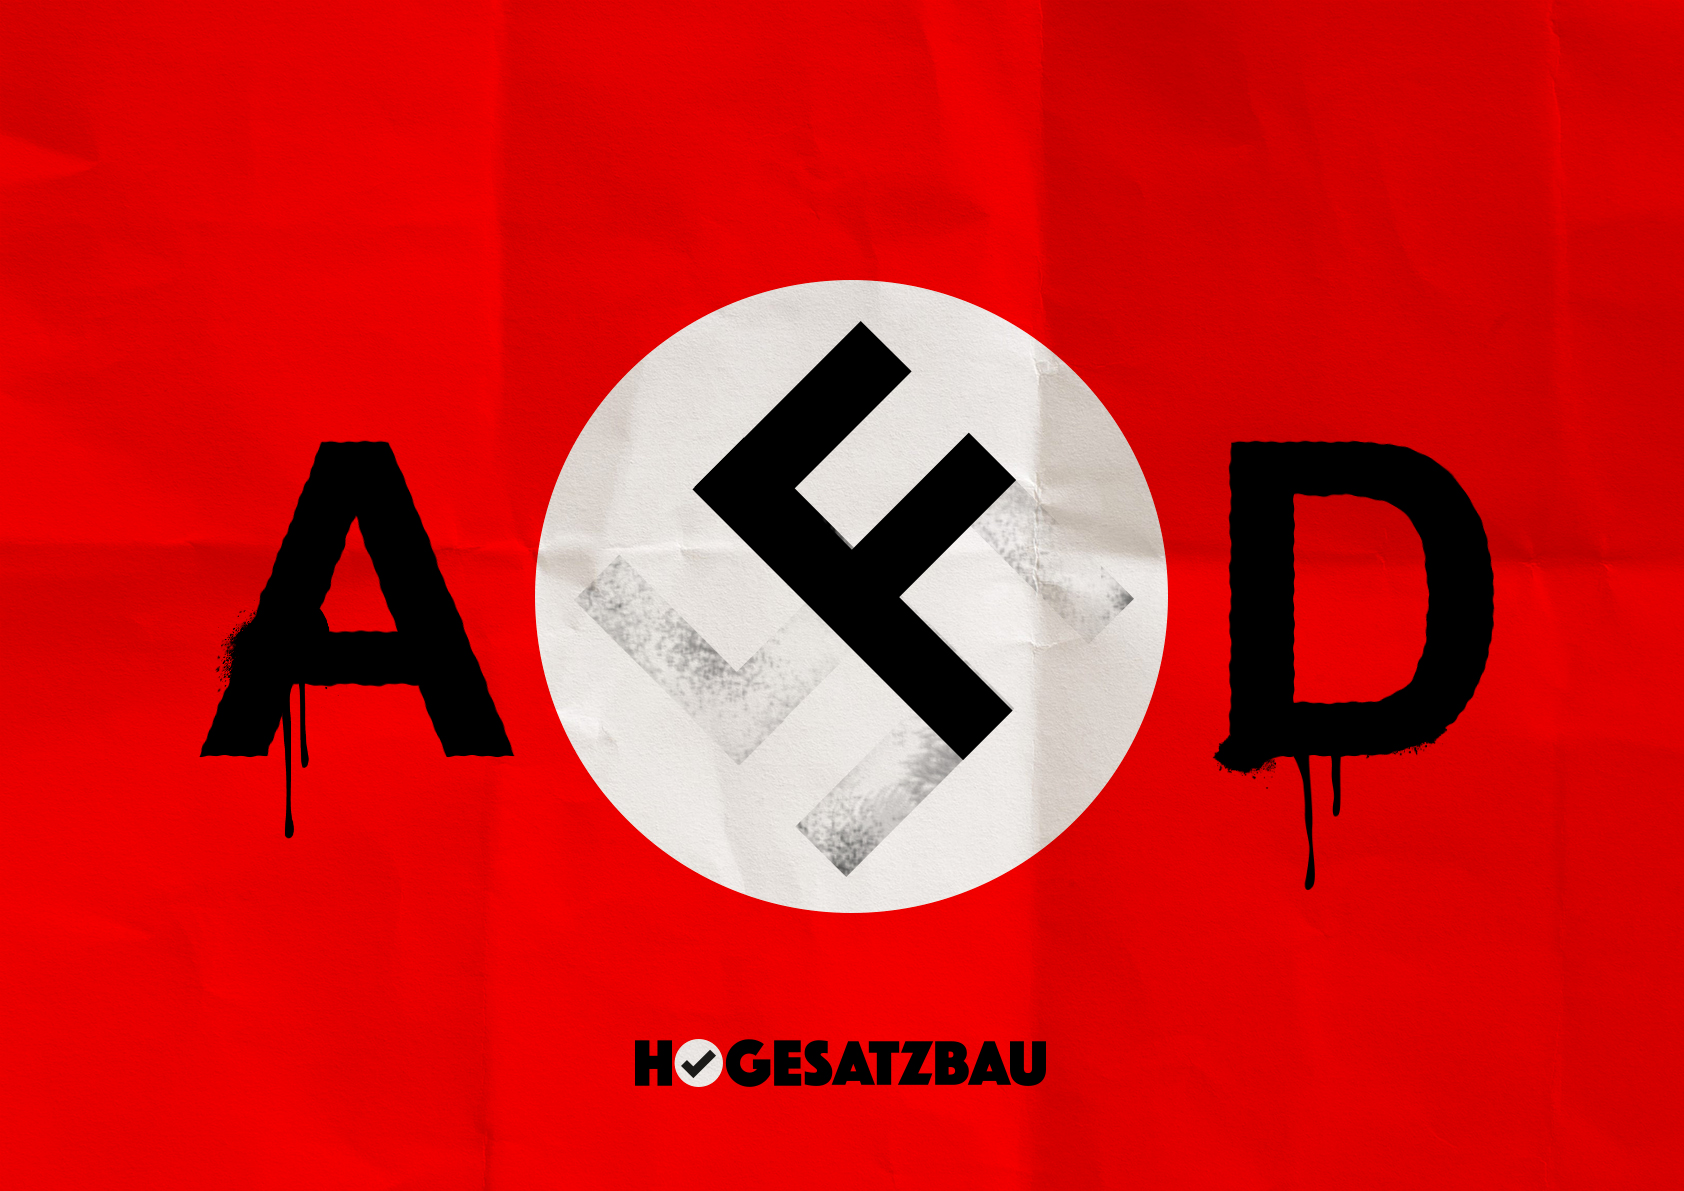 afd-hknkrz-fahne